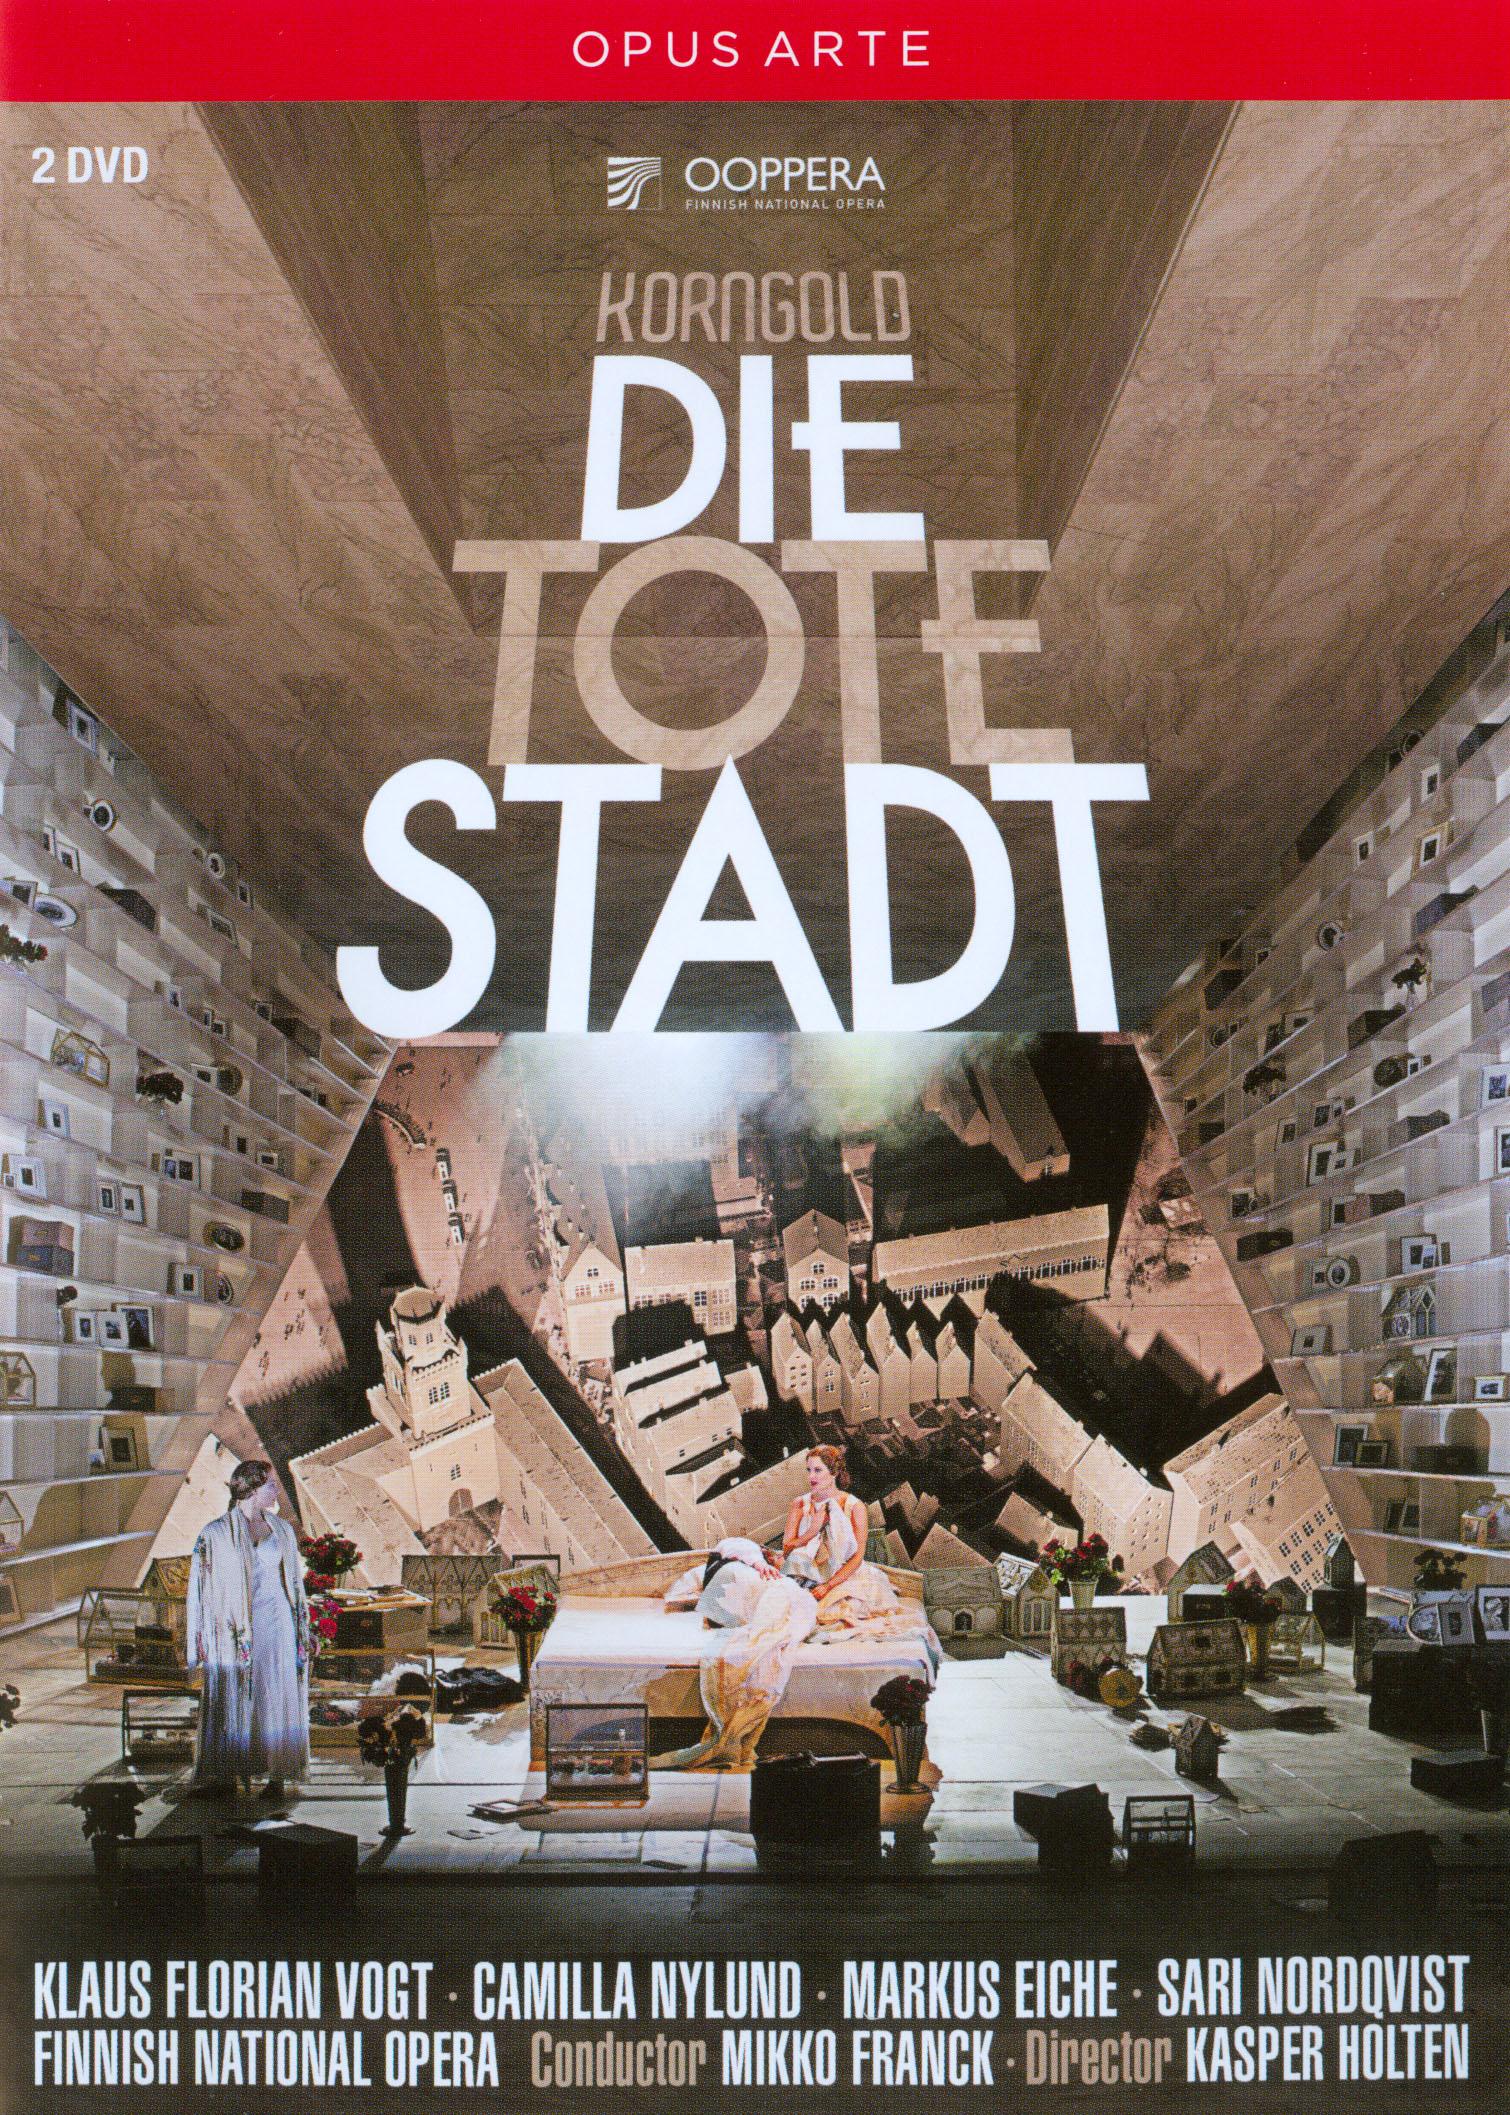 Die Tote Stadt (Finnish National Opera)